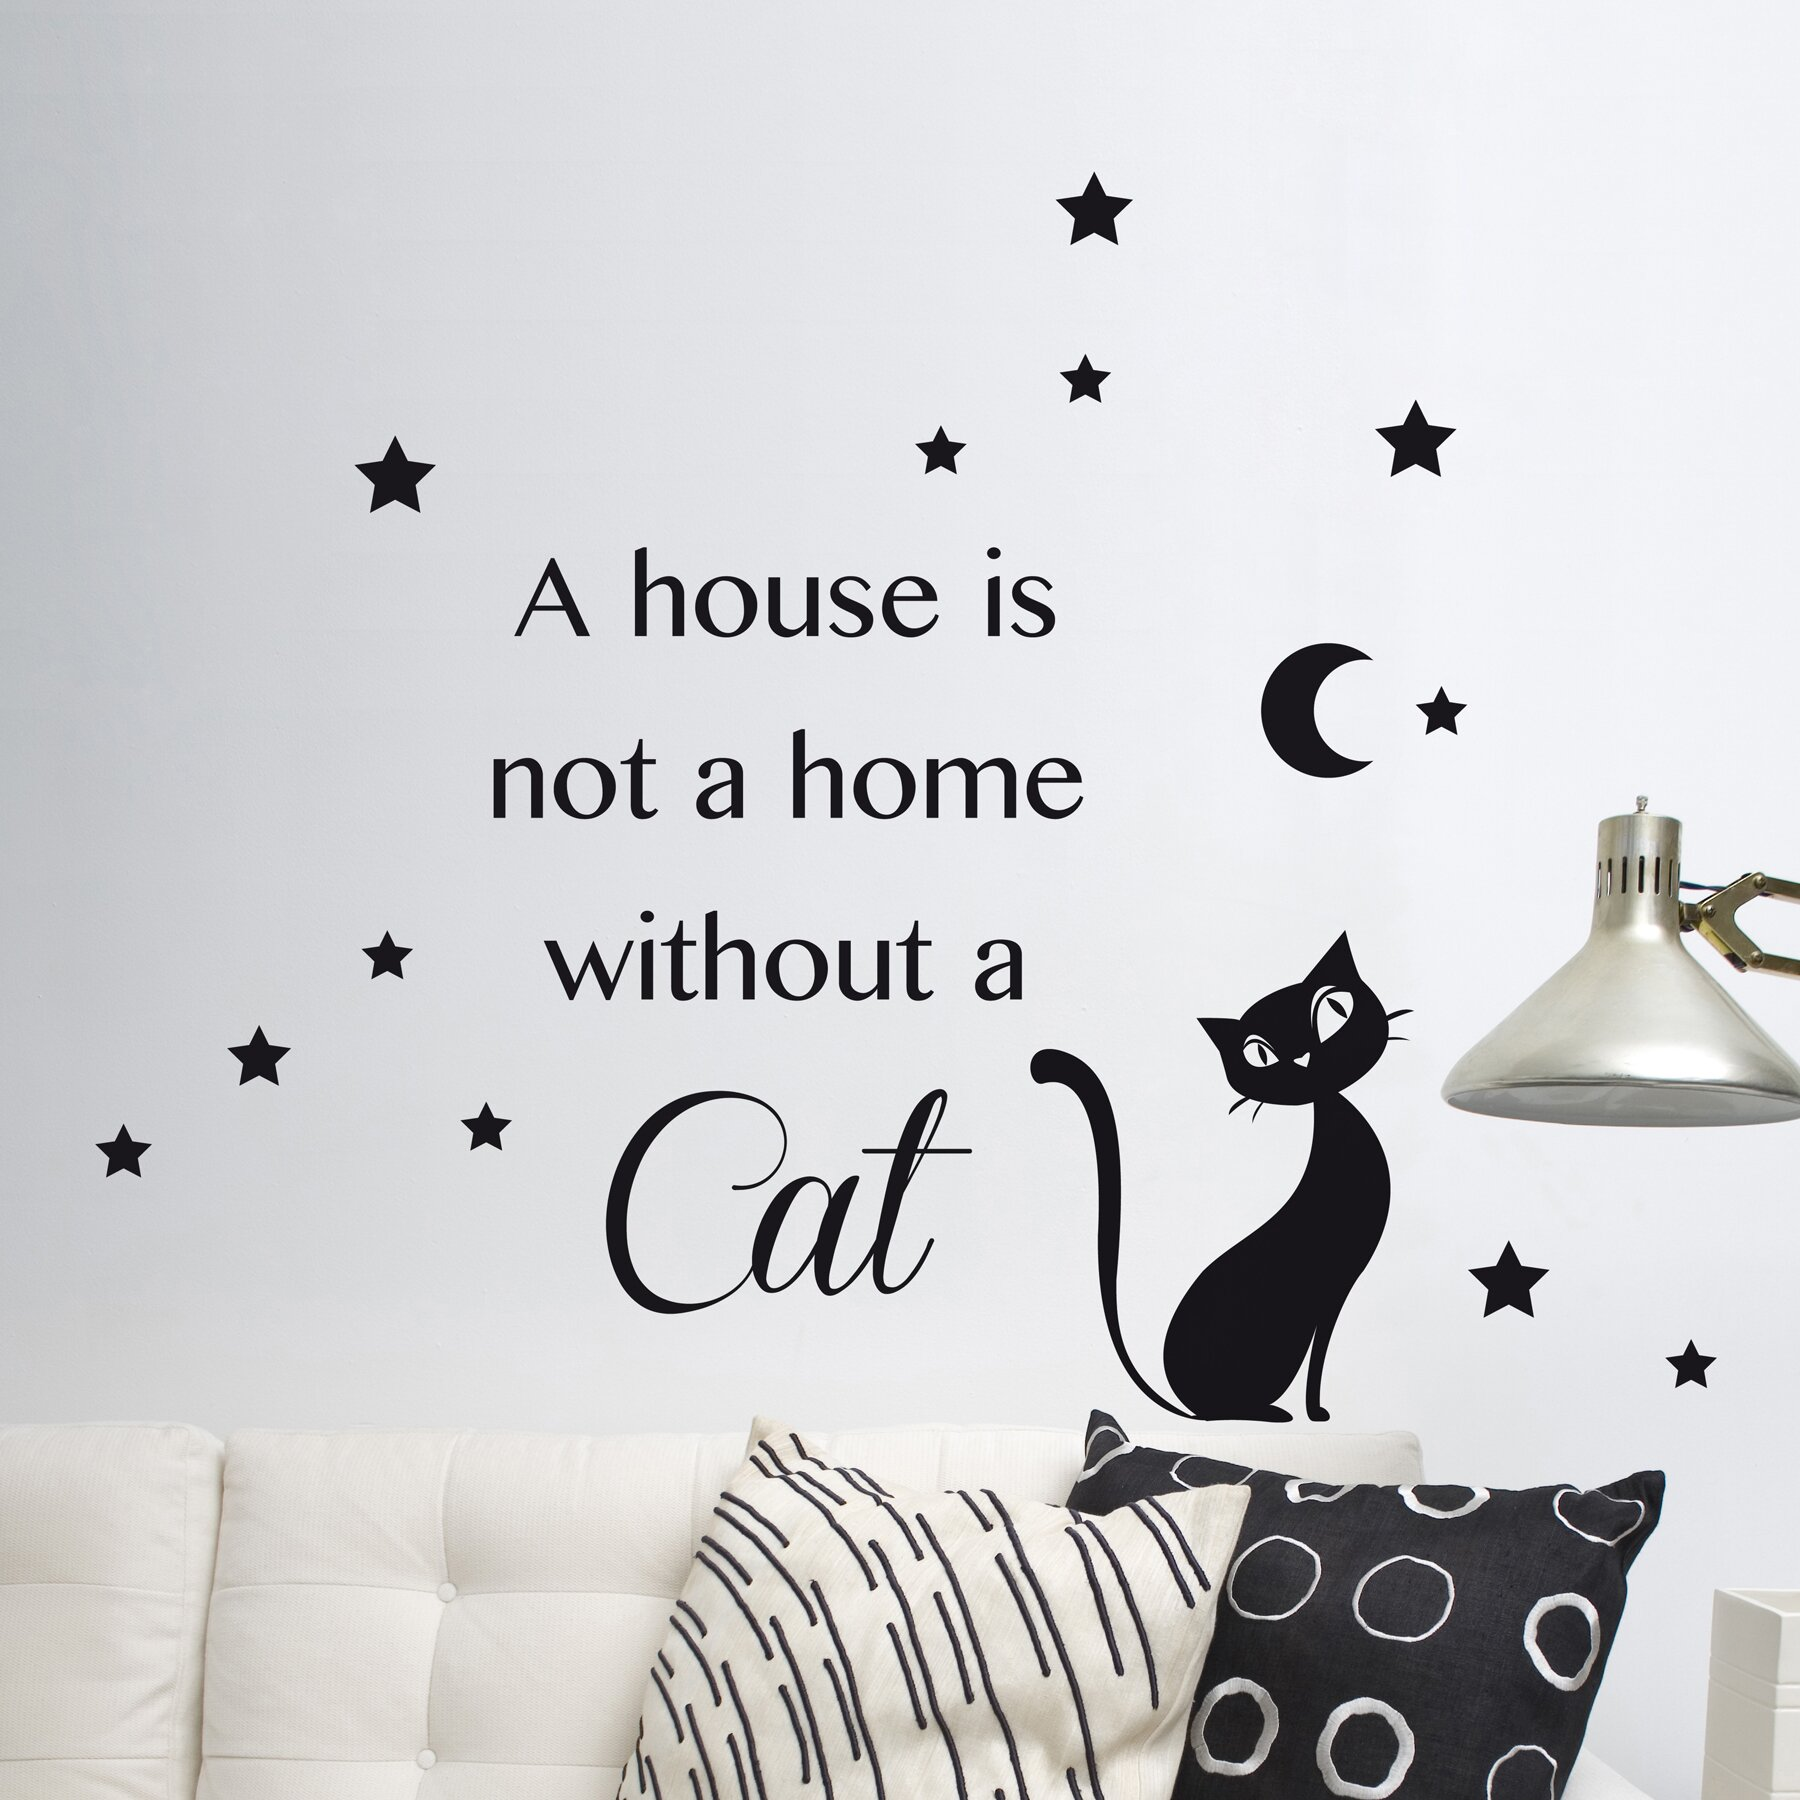 Wallpops Home Decor Line Cat Silhouette Wall Decal Reviews Wayfair